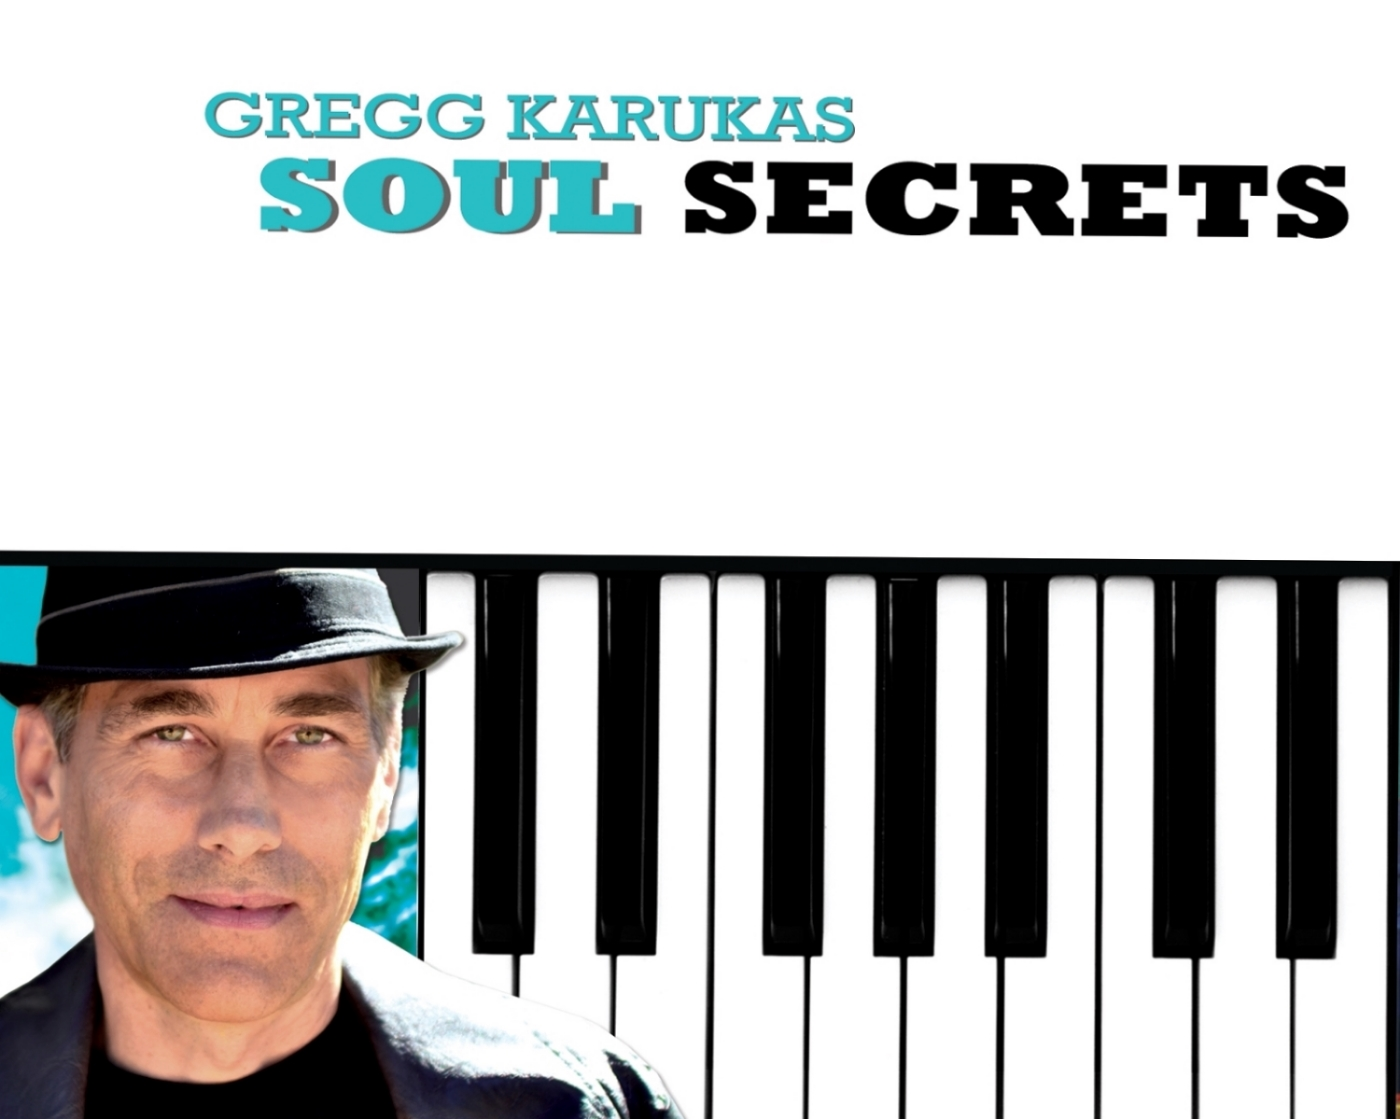 Gregg Karukas Soul Secrets CD cover rgb.jpg